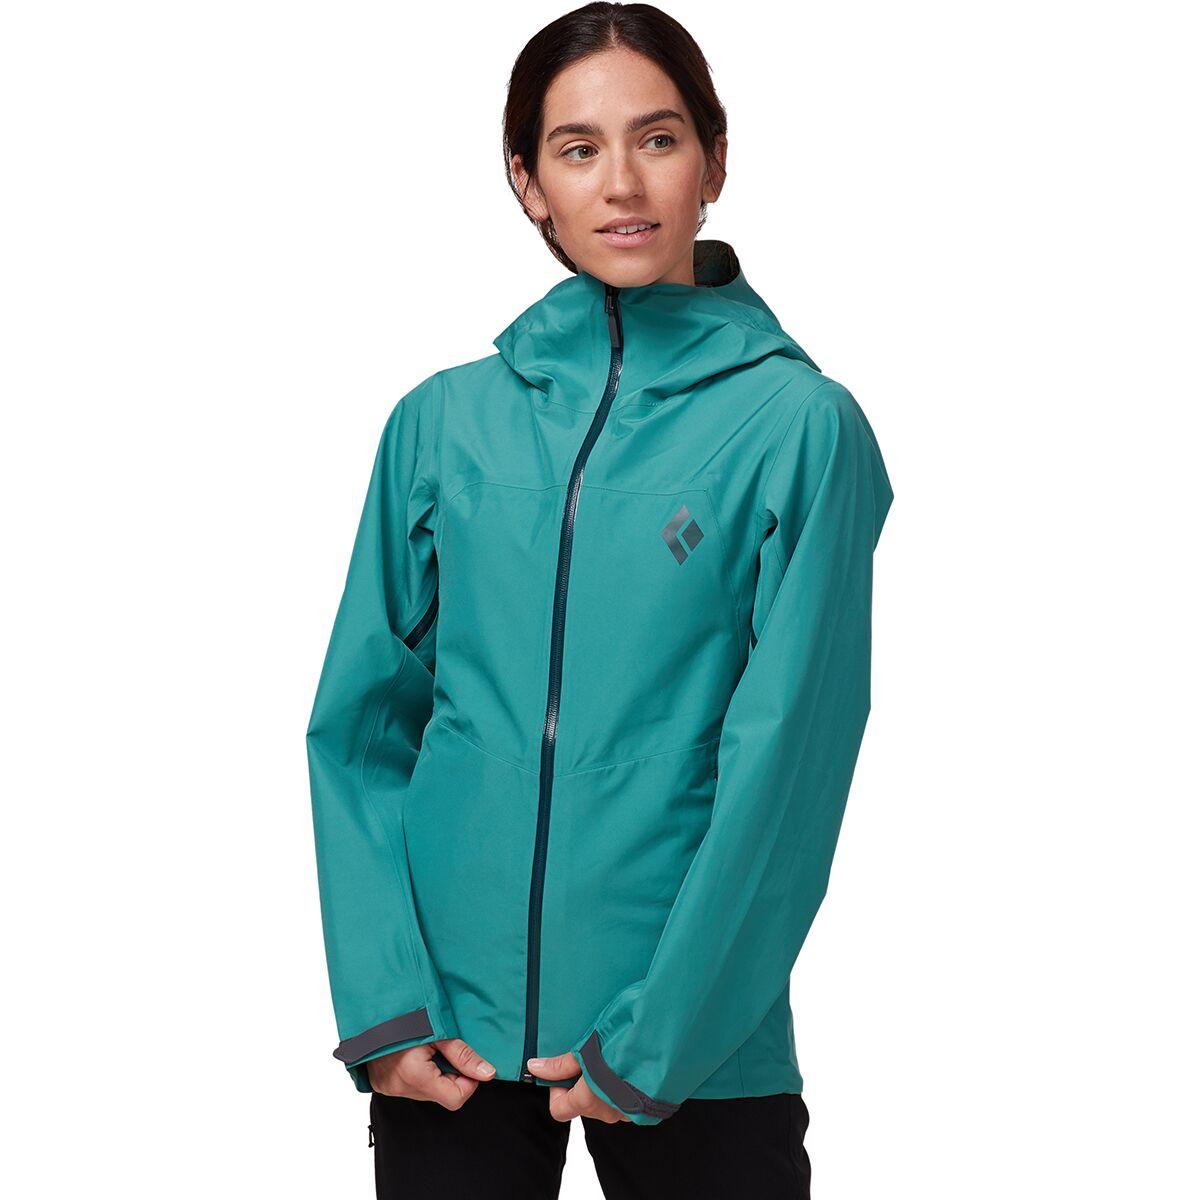 Liquid Point Shell Jacket - Women